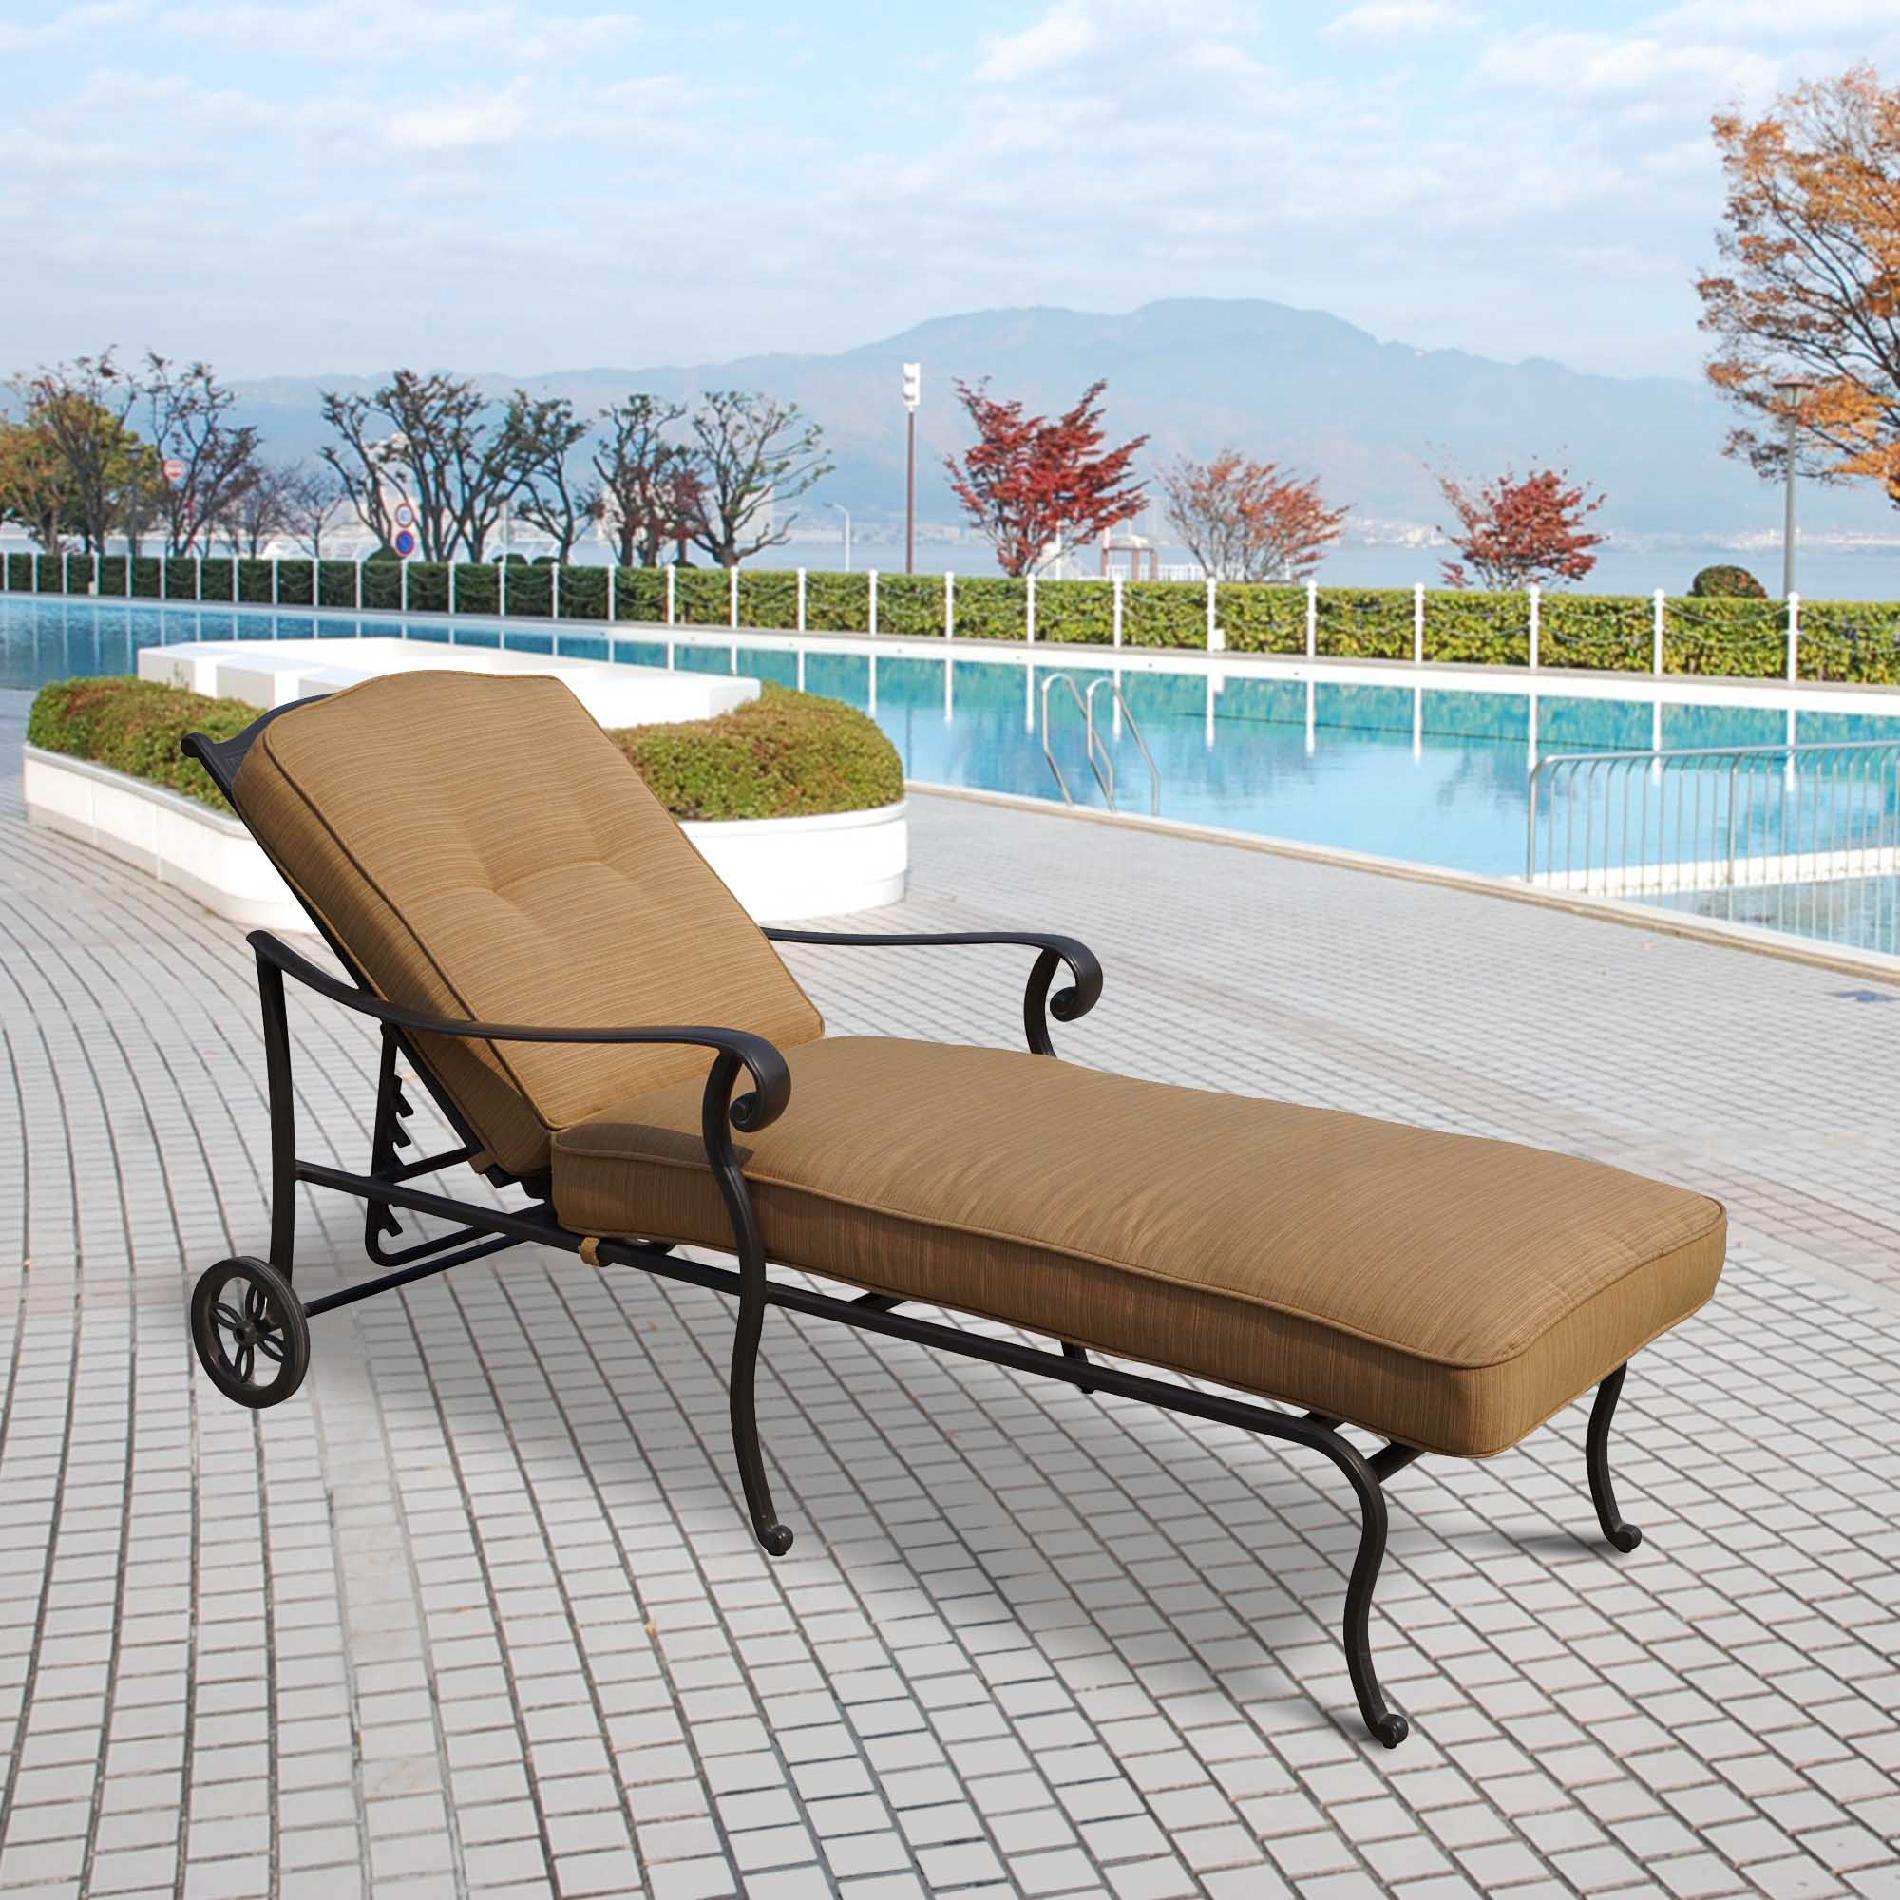 sun lounge chairs kmart antique desk chair sunjoy gracefield outdoor living patio